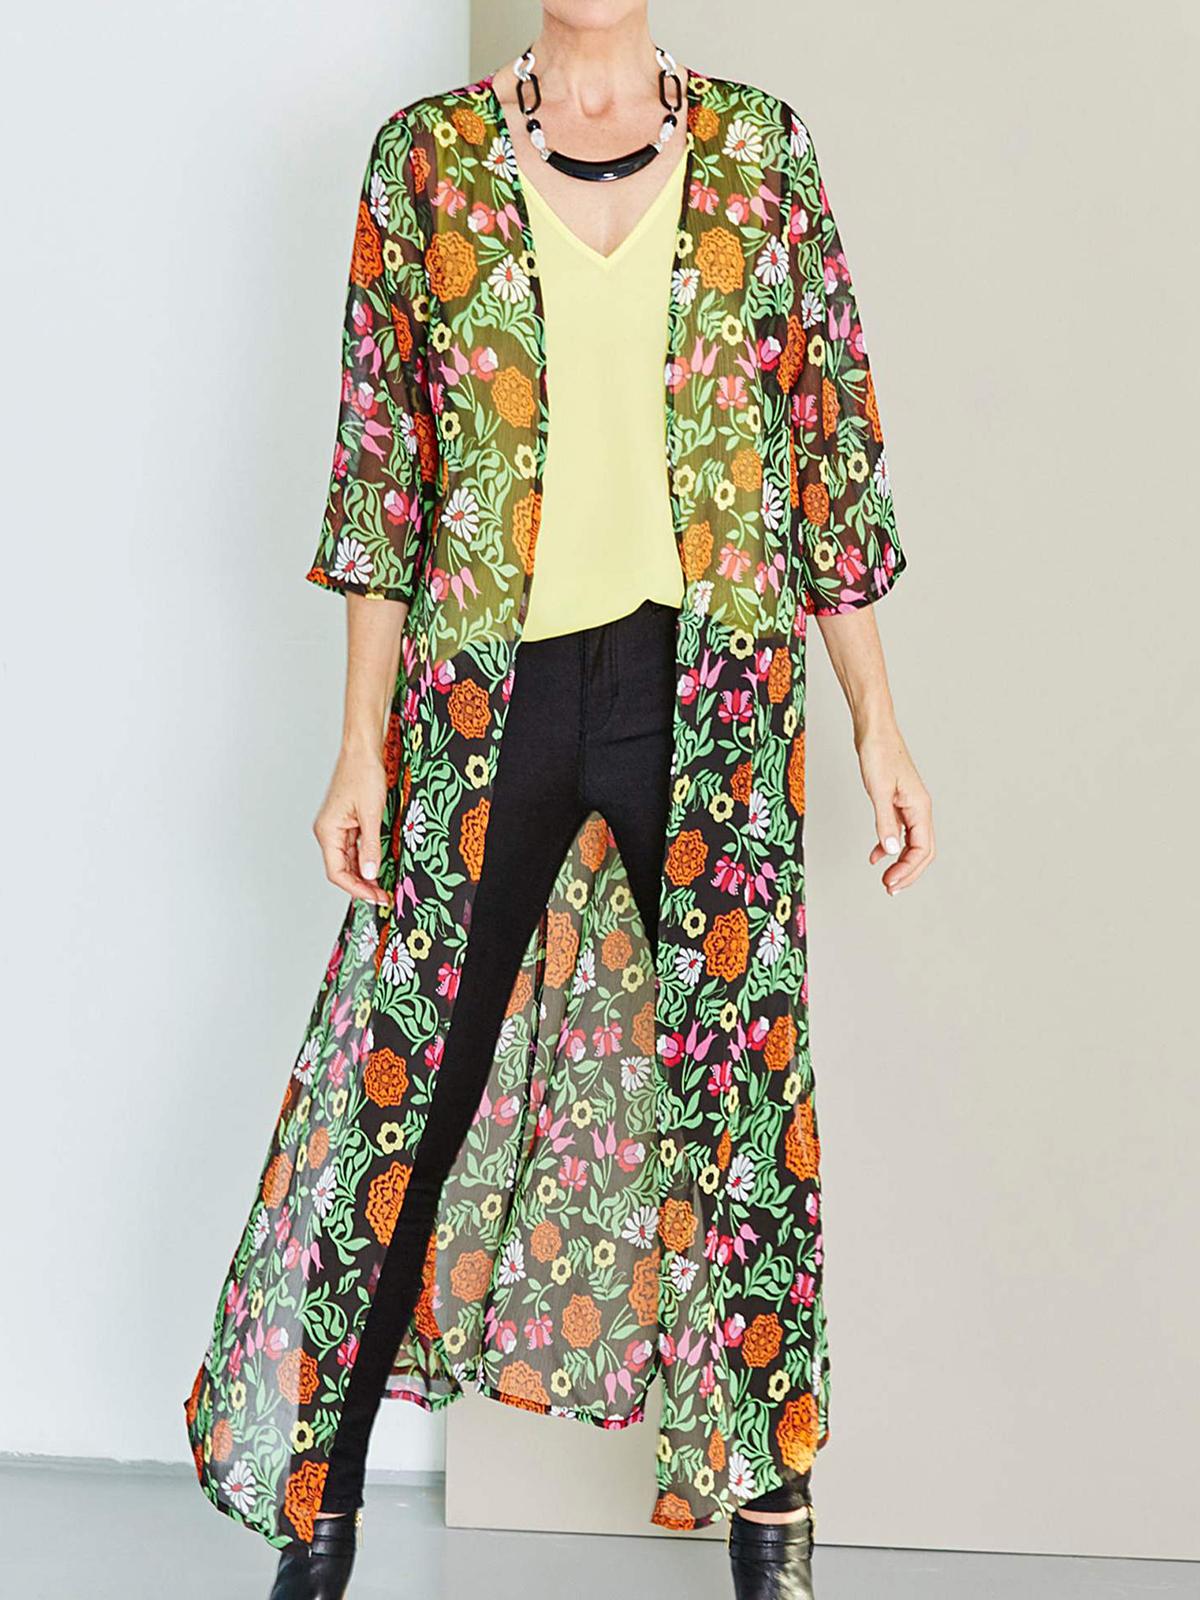 15c5cd67a7 Label Be - - LabelBe MULTI Floral Printed Longline Kimono - Plus Size 16 to  32